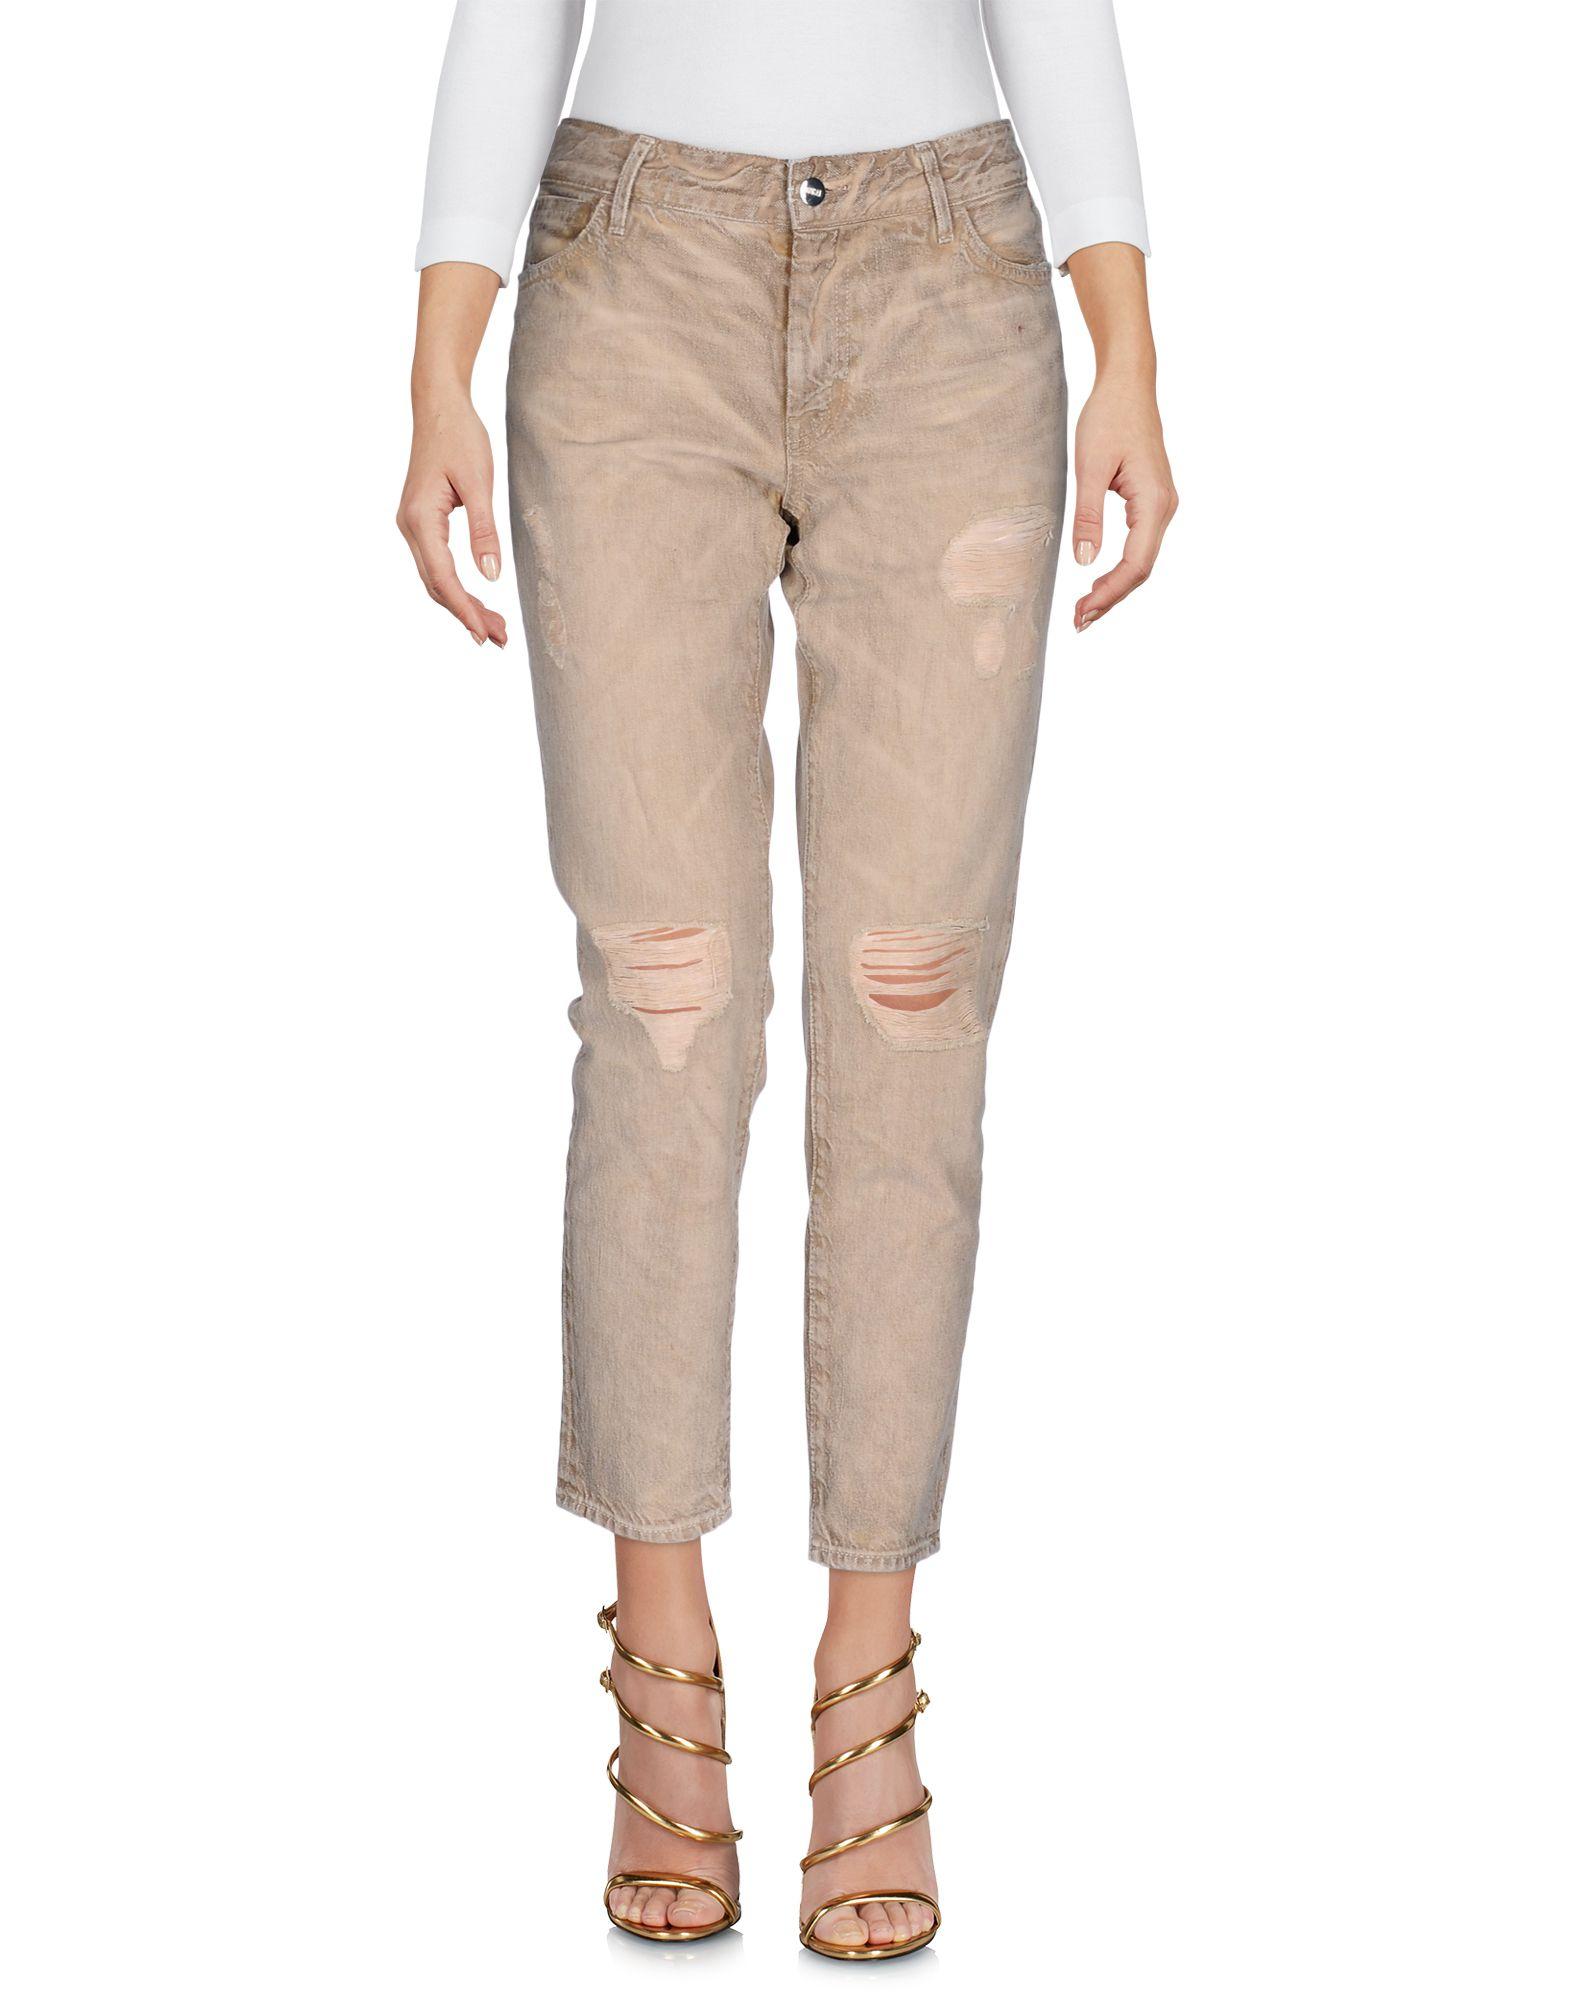 Pantaloni Jeans Koral Donna - Acquista online su 0UpNrLr1iU